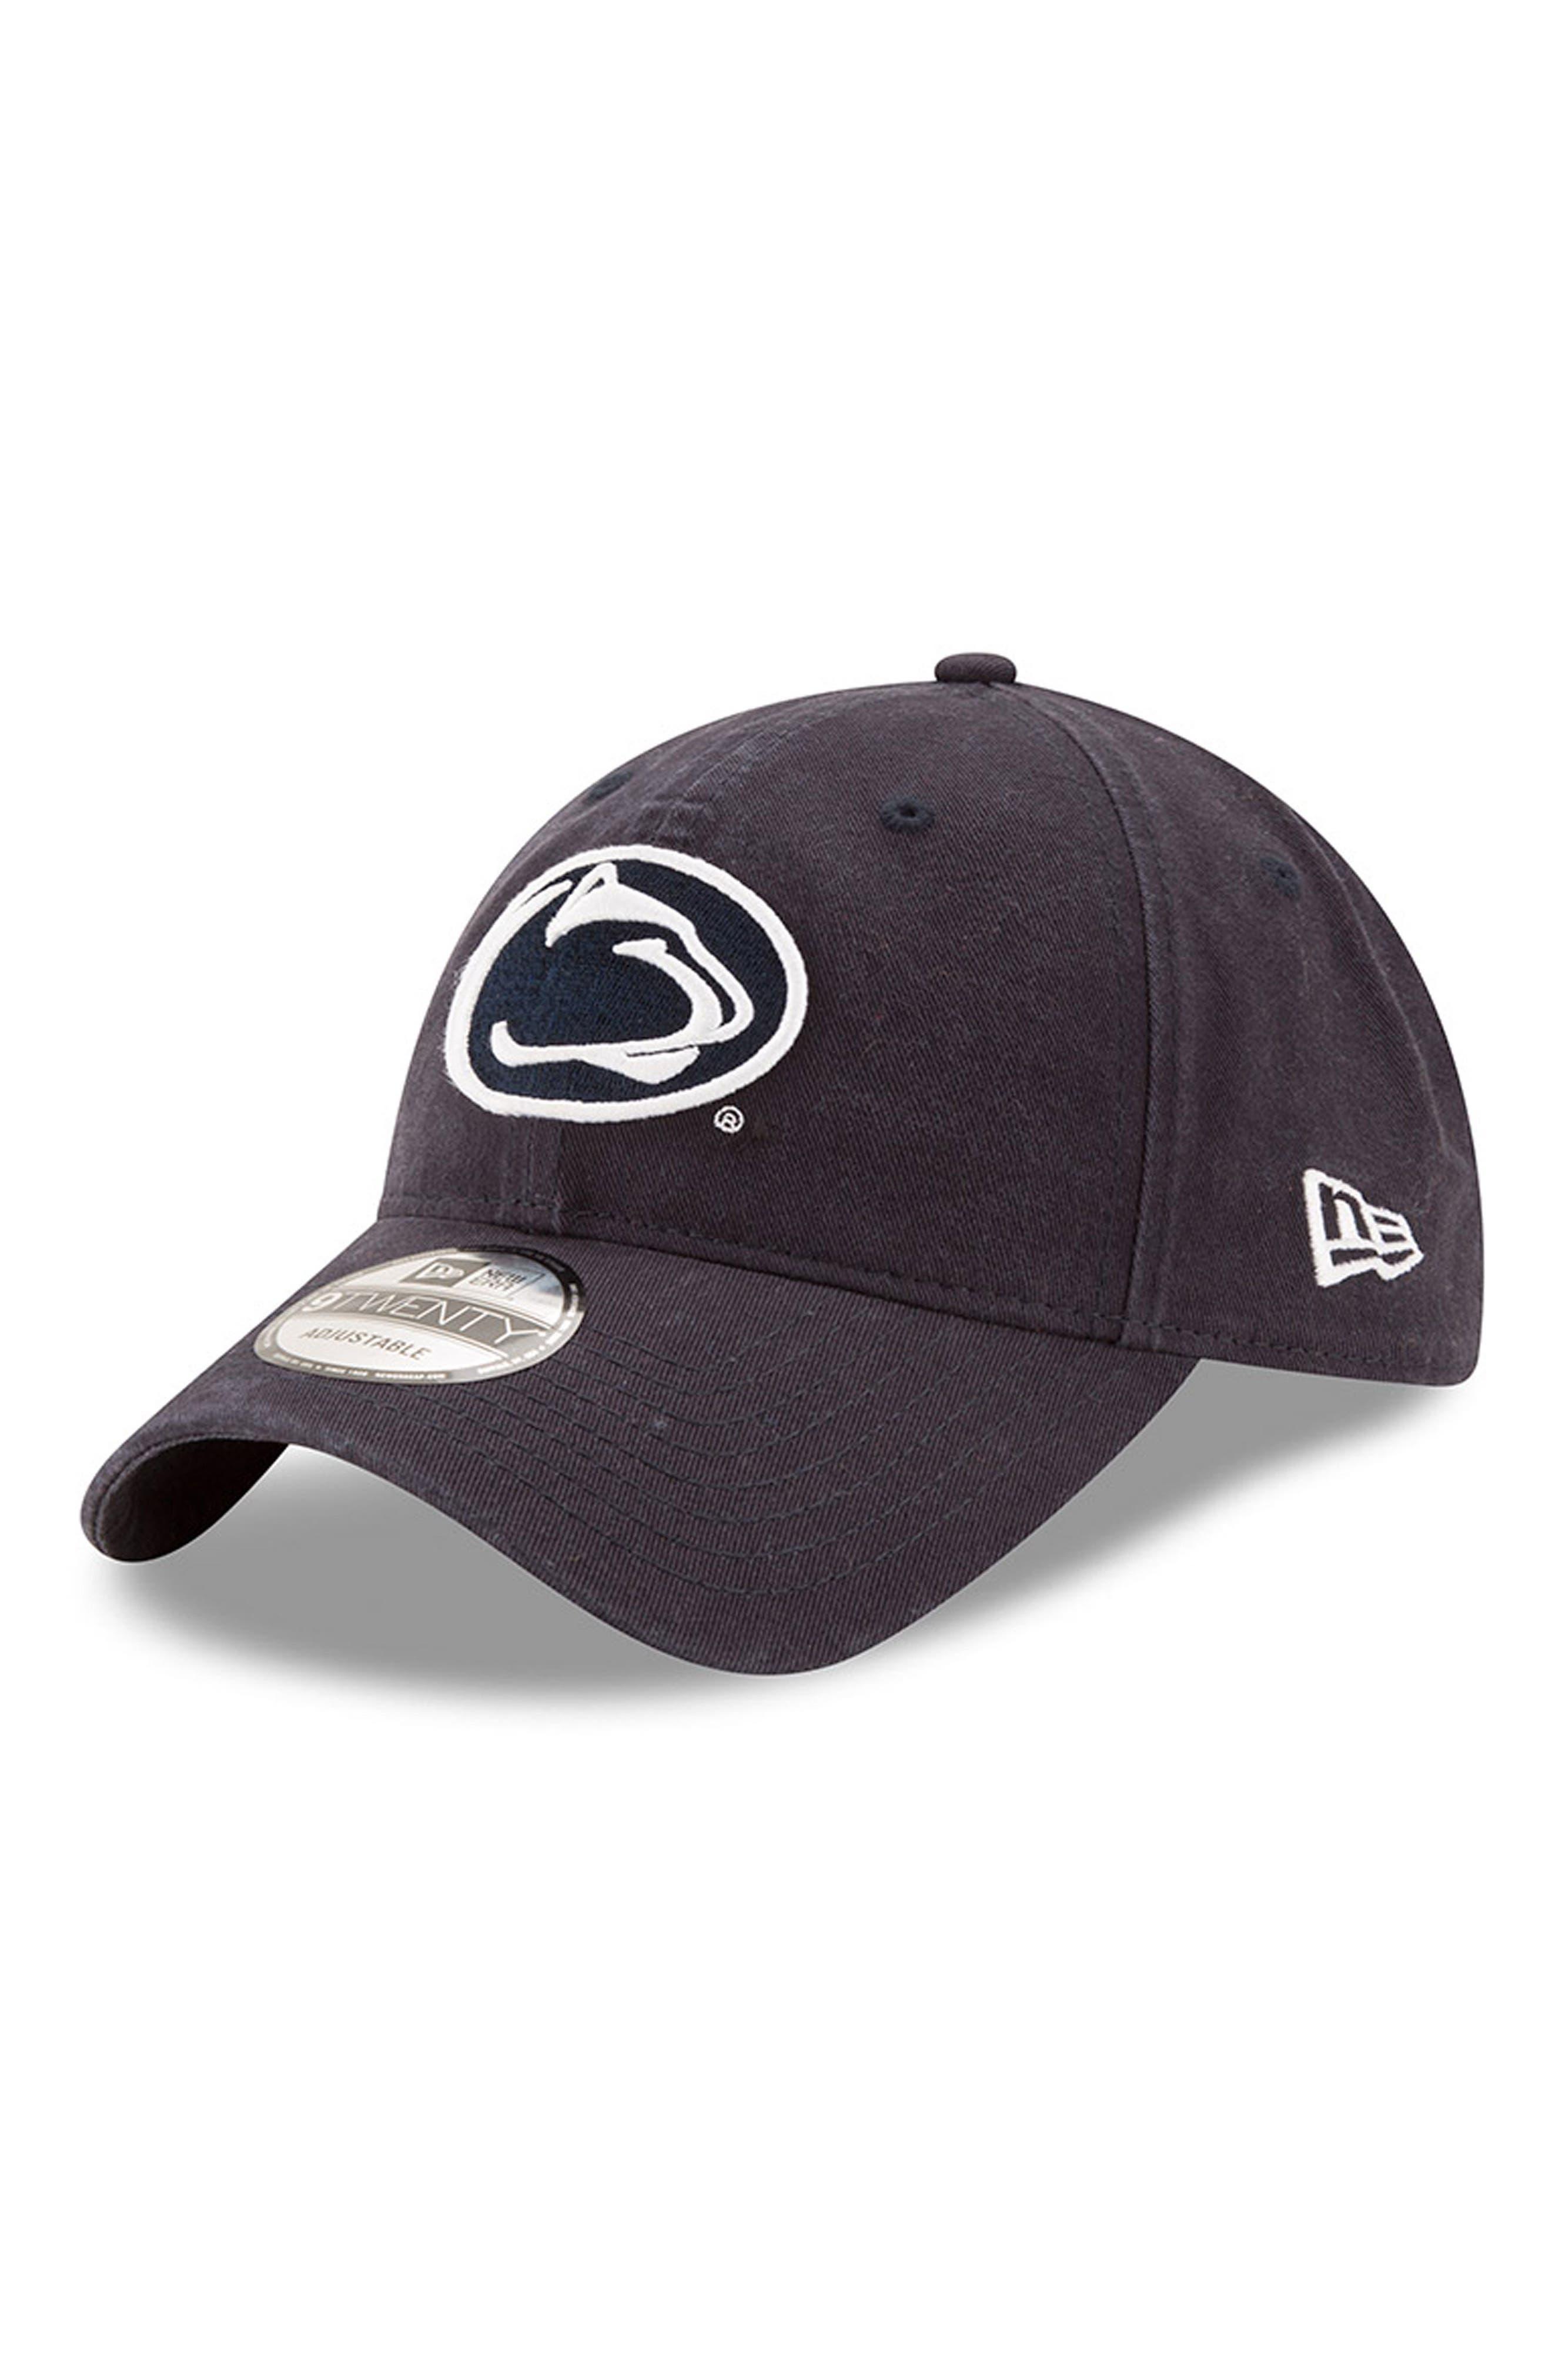 New Era Collegiate Core Classic - Penn State Nittany Lions Baseball Cap,                             Main thumbnail 1, color,